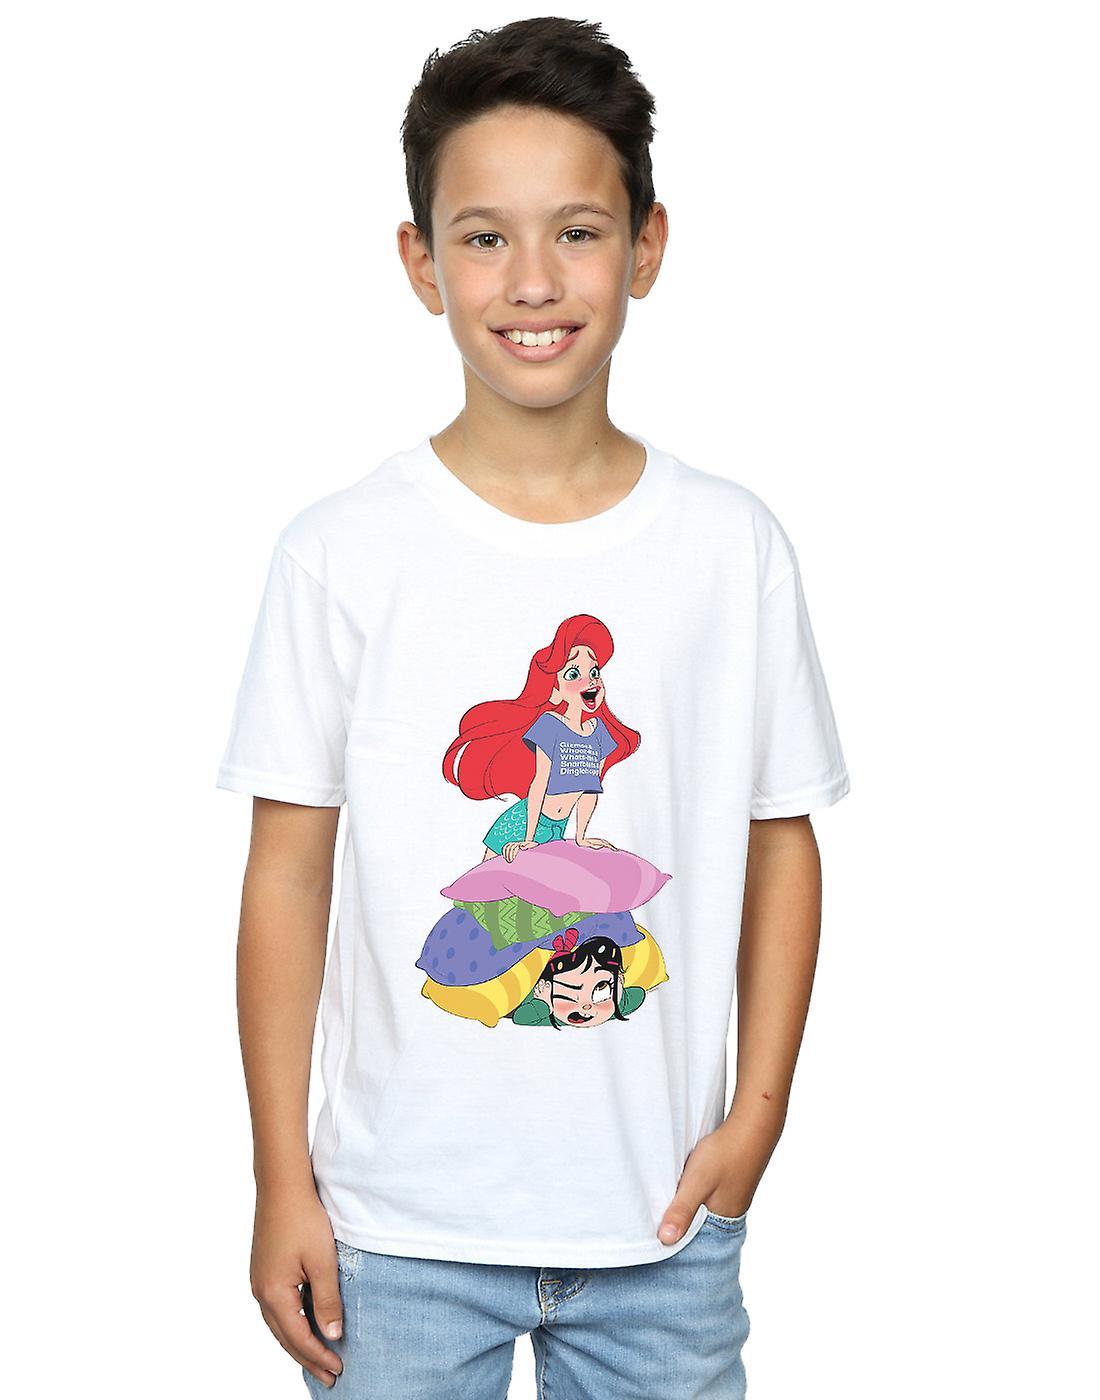 Disney Boys Wreck It Ralph Ariel And Vanellope T-Shirt